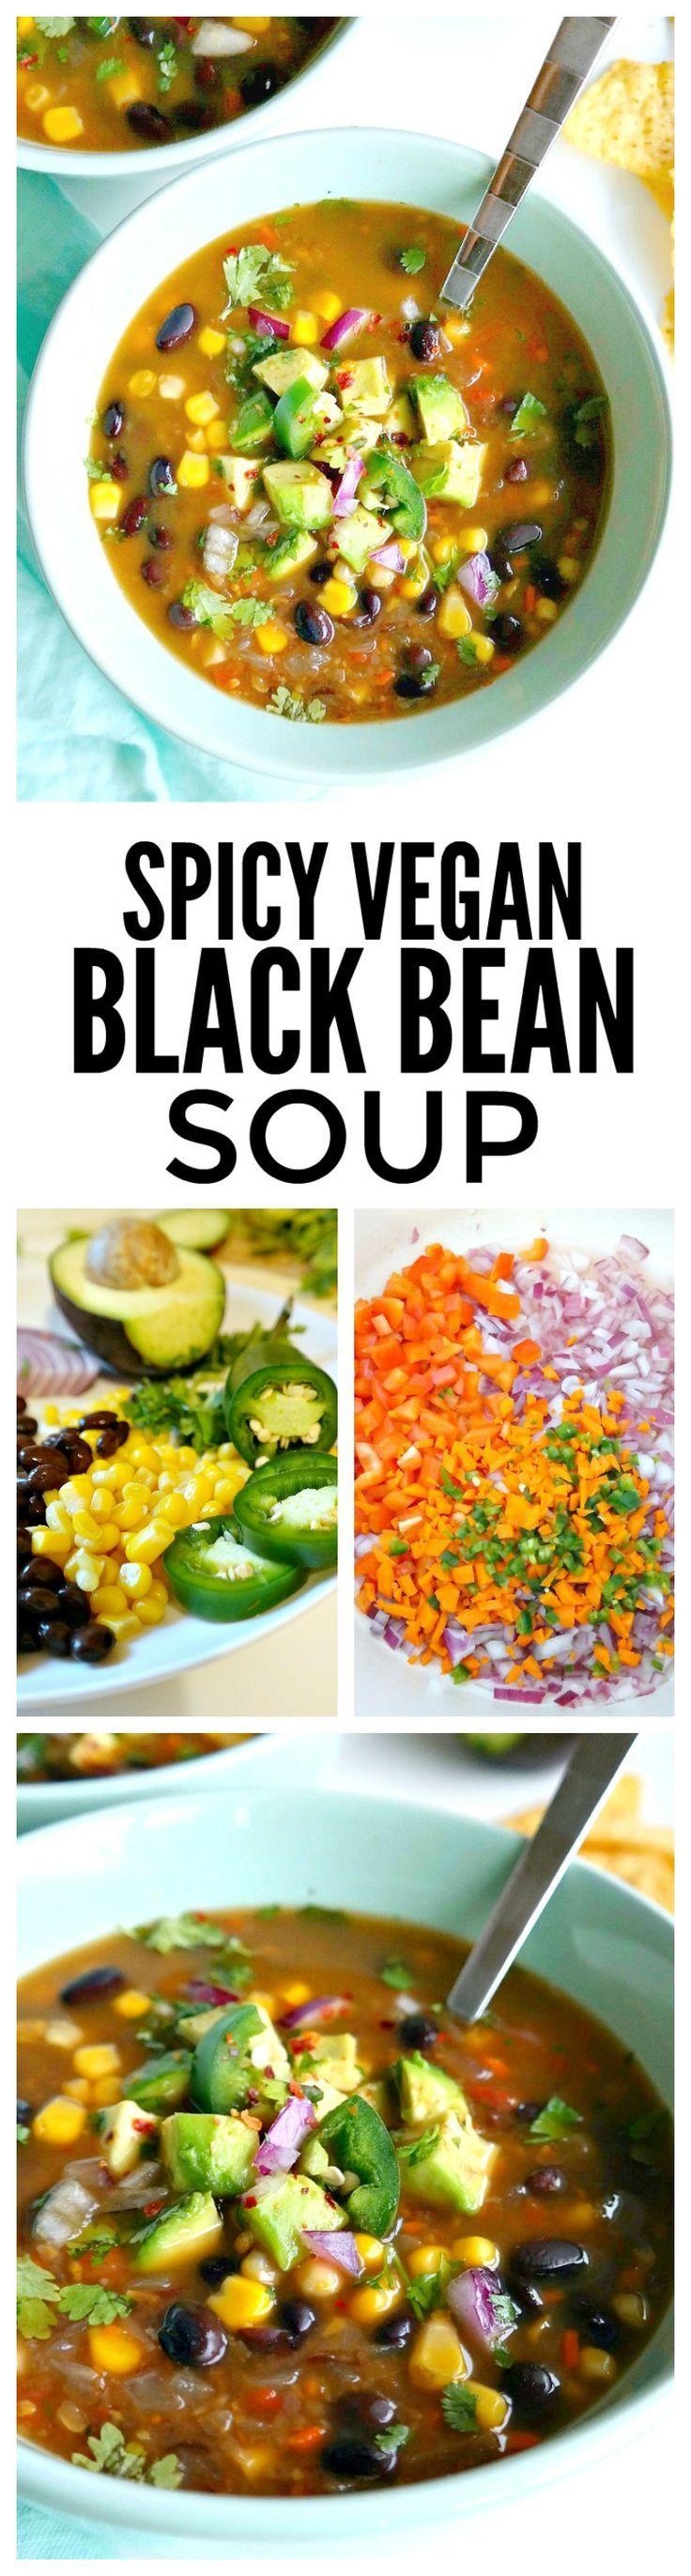 Spicy Vegan Black Bean Soup. Healthy, delicious, simple, packed with extra veggi Spicy Vegan Black Bean Soup. Healthy, delicious, simple, packed with extra veggi... -